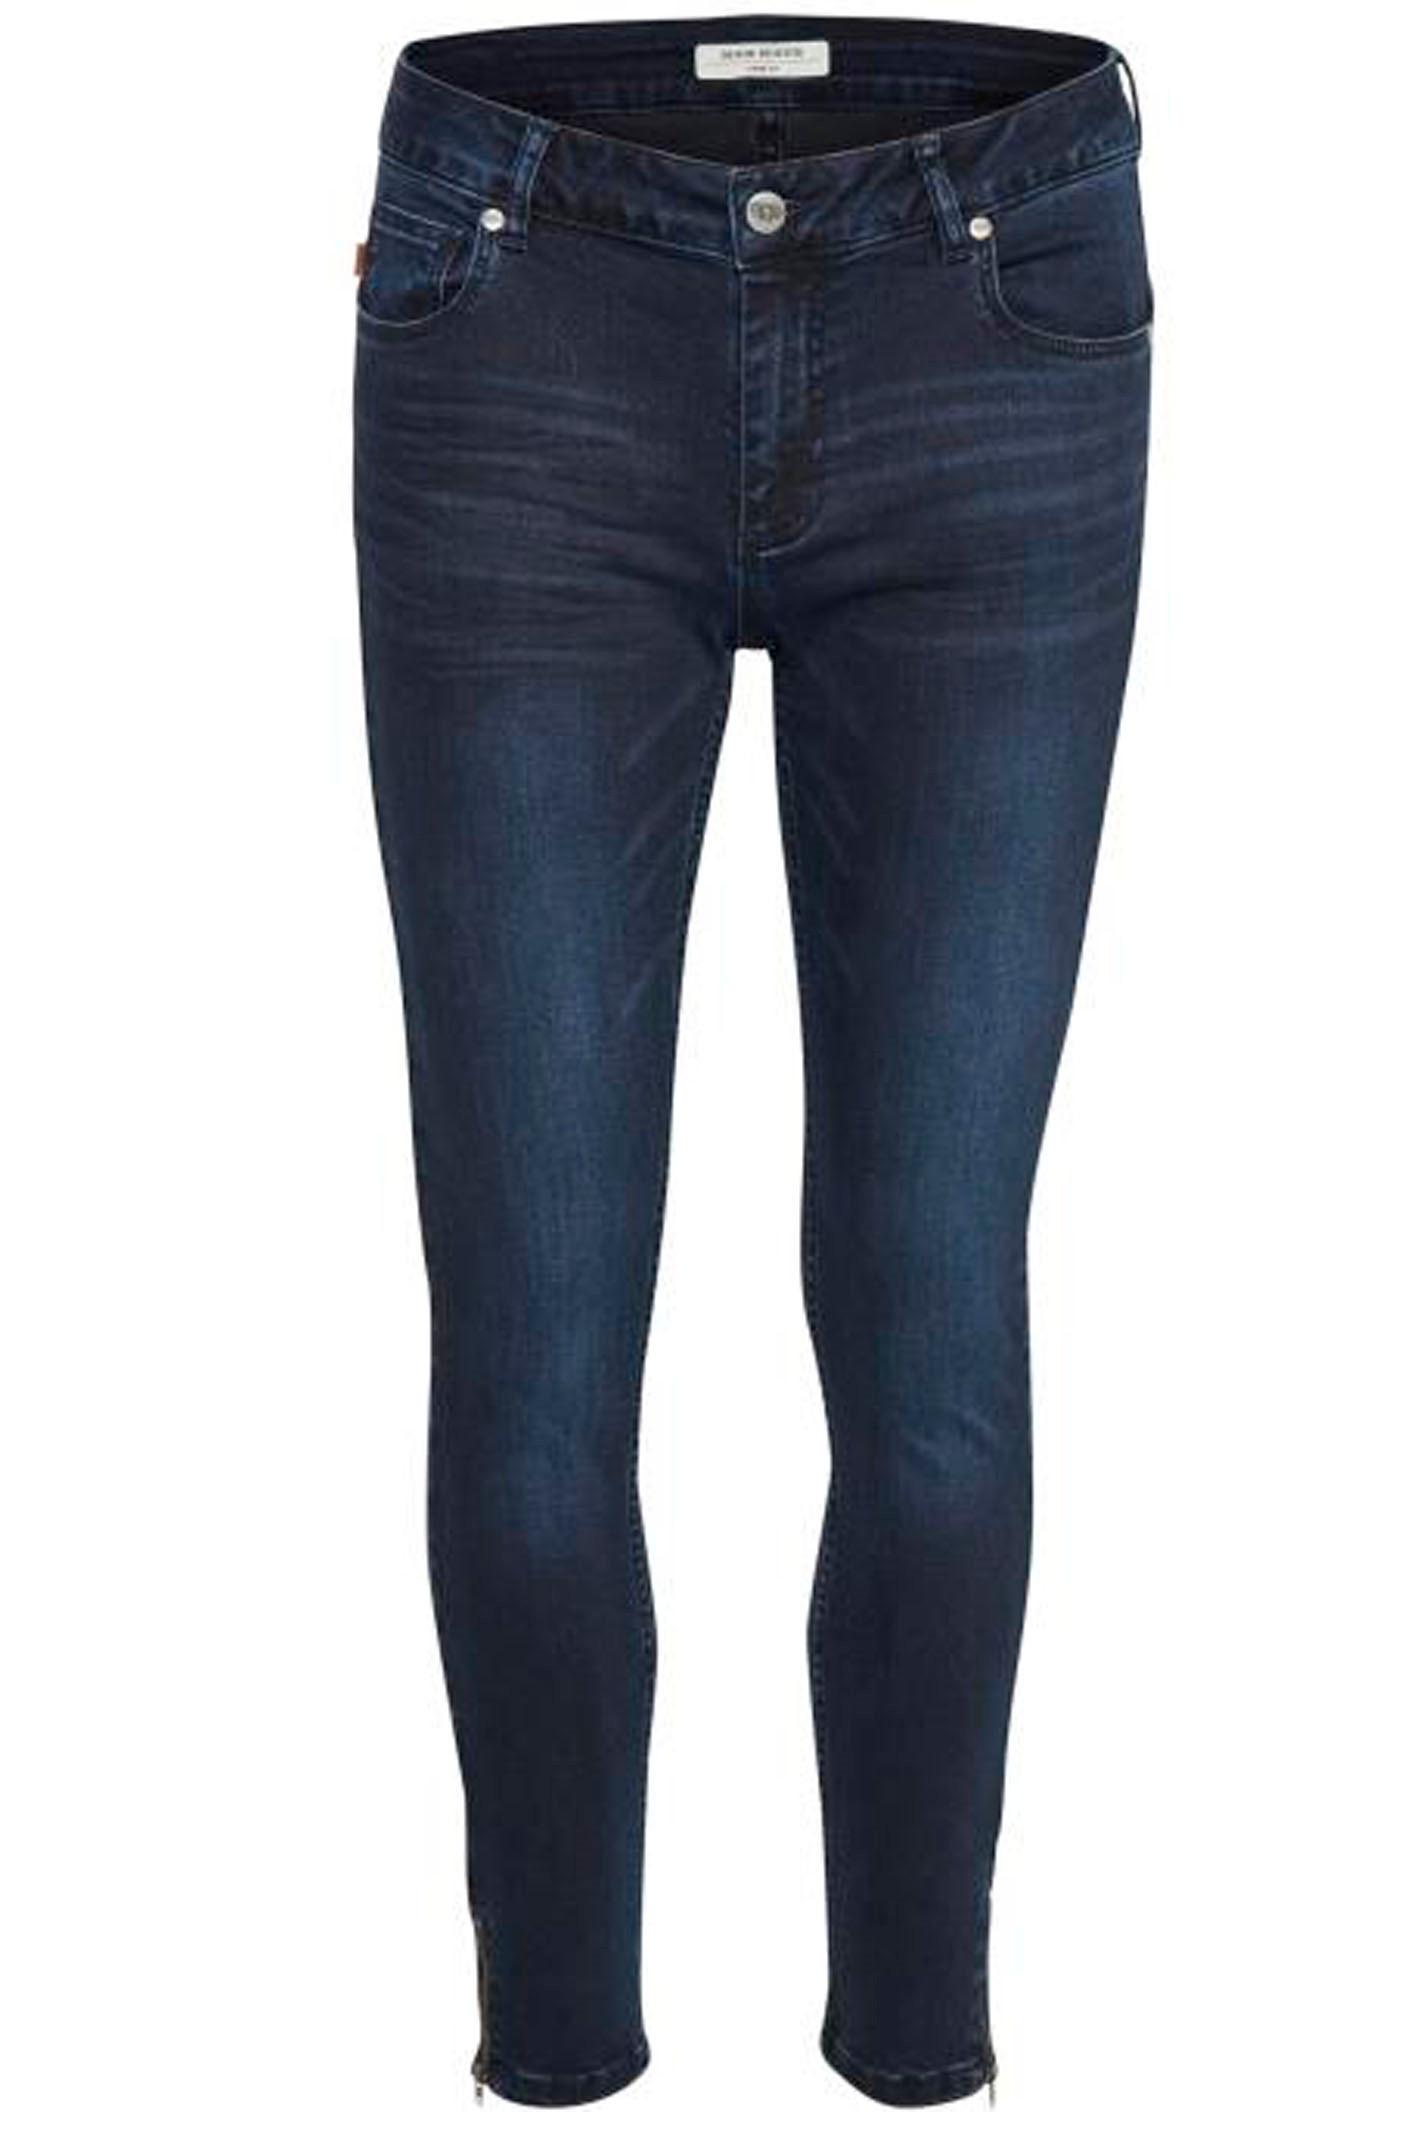 DENIM HUNTER Celina Zip 10702933 Dark blue Wash custom